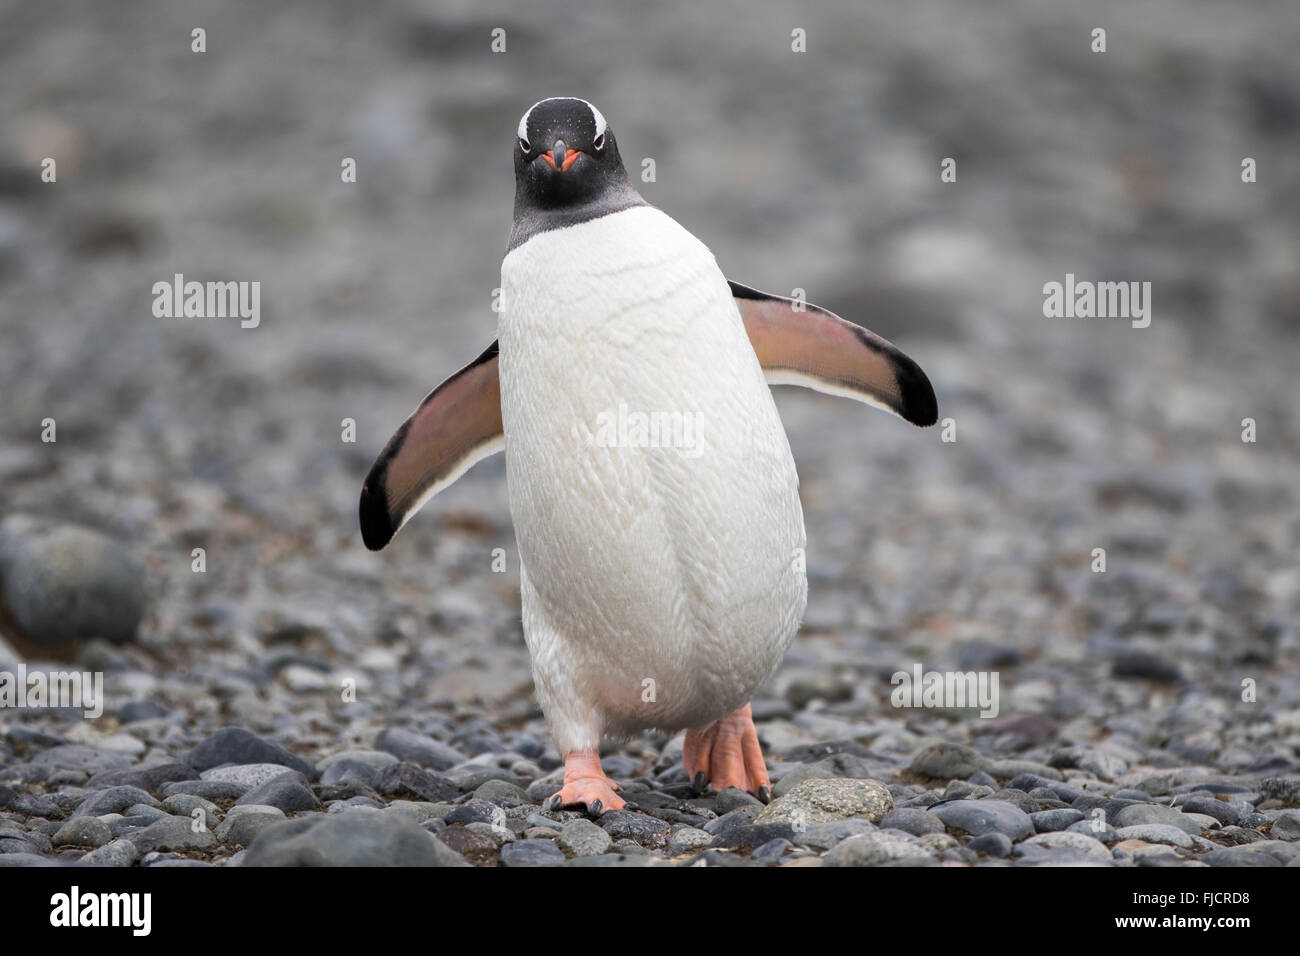 L'Antartide penguin, pinguini, Antartico. I pinguini di Gentoo (Pygoscelis papua). Immagini Stock